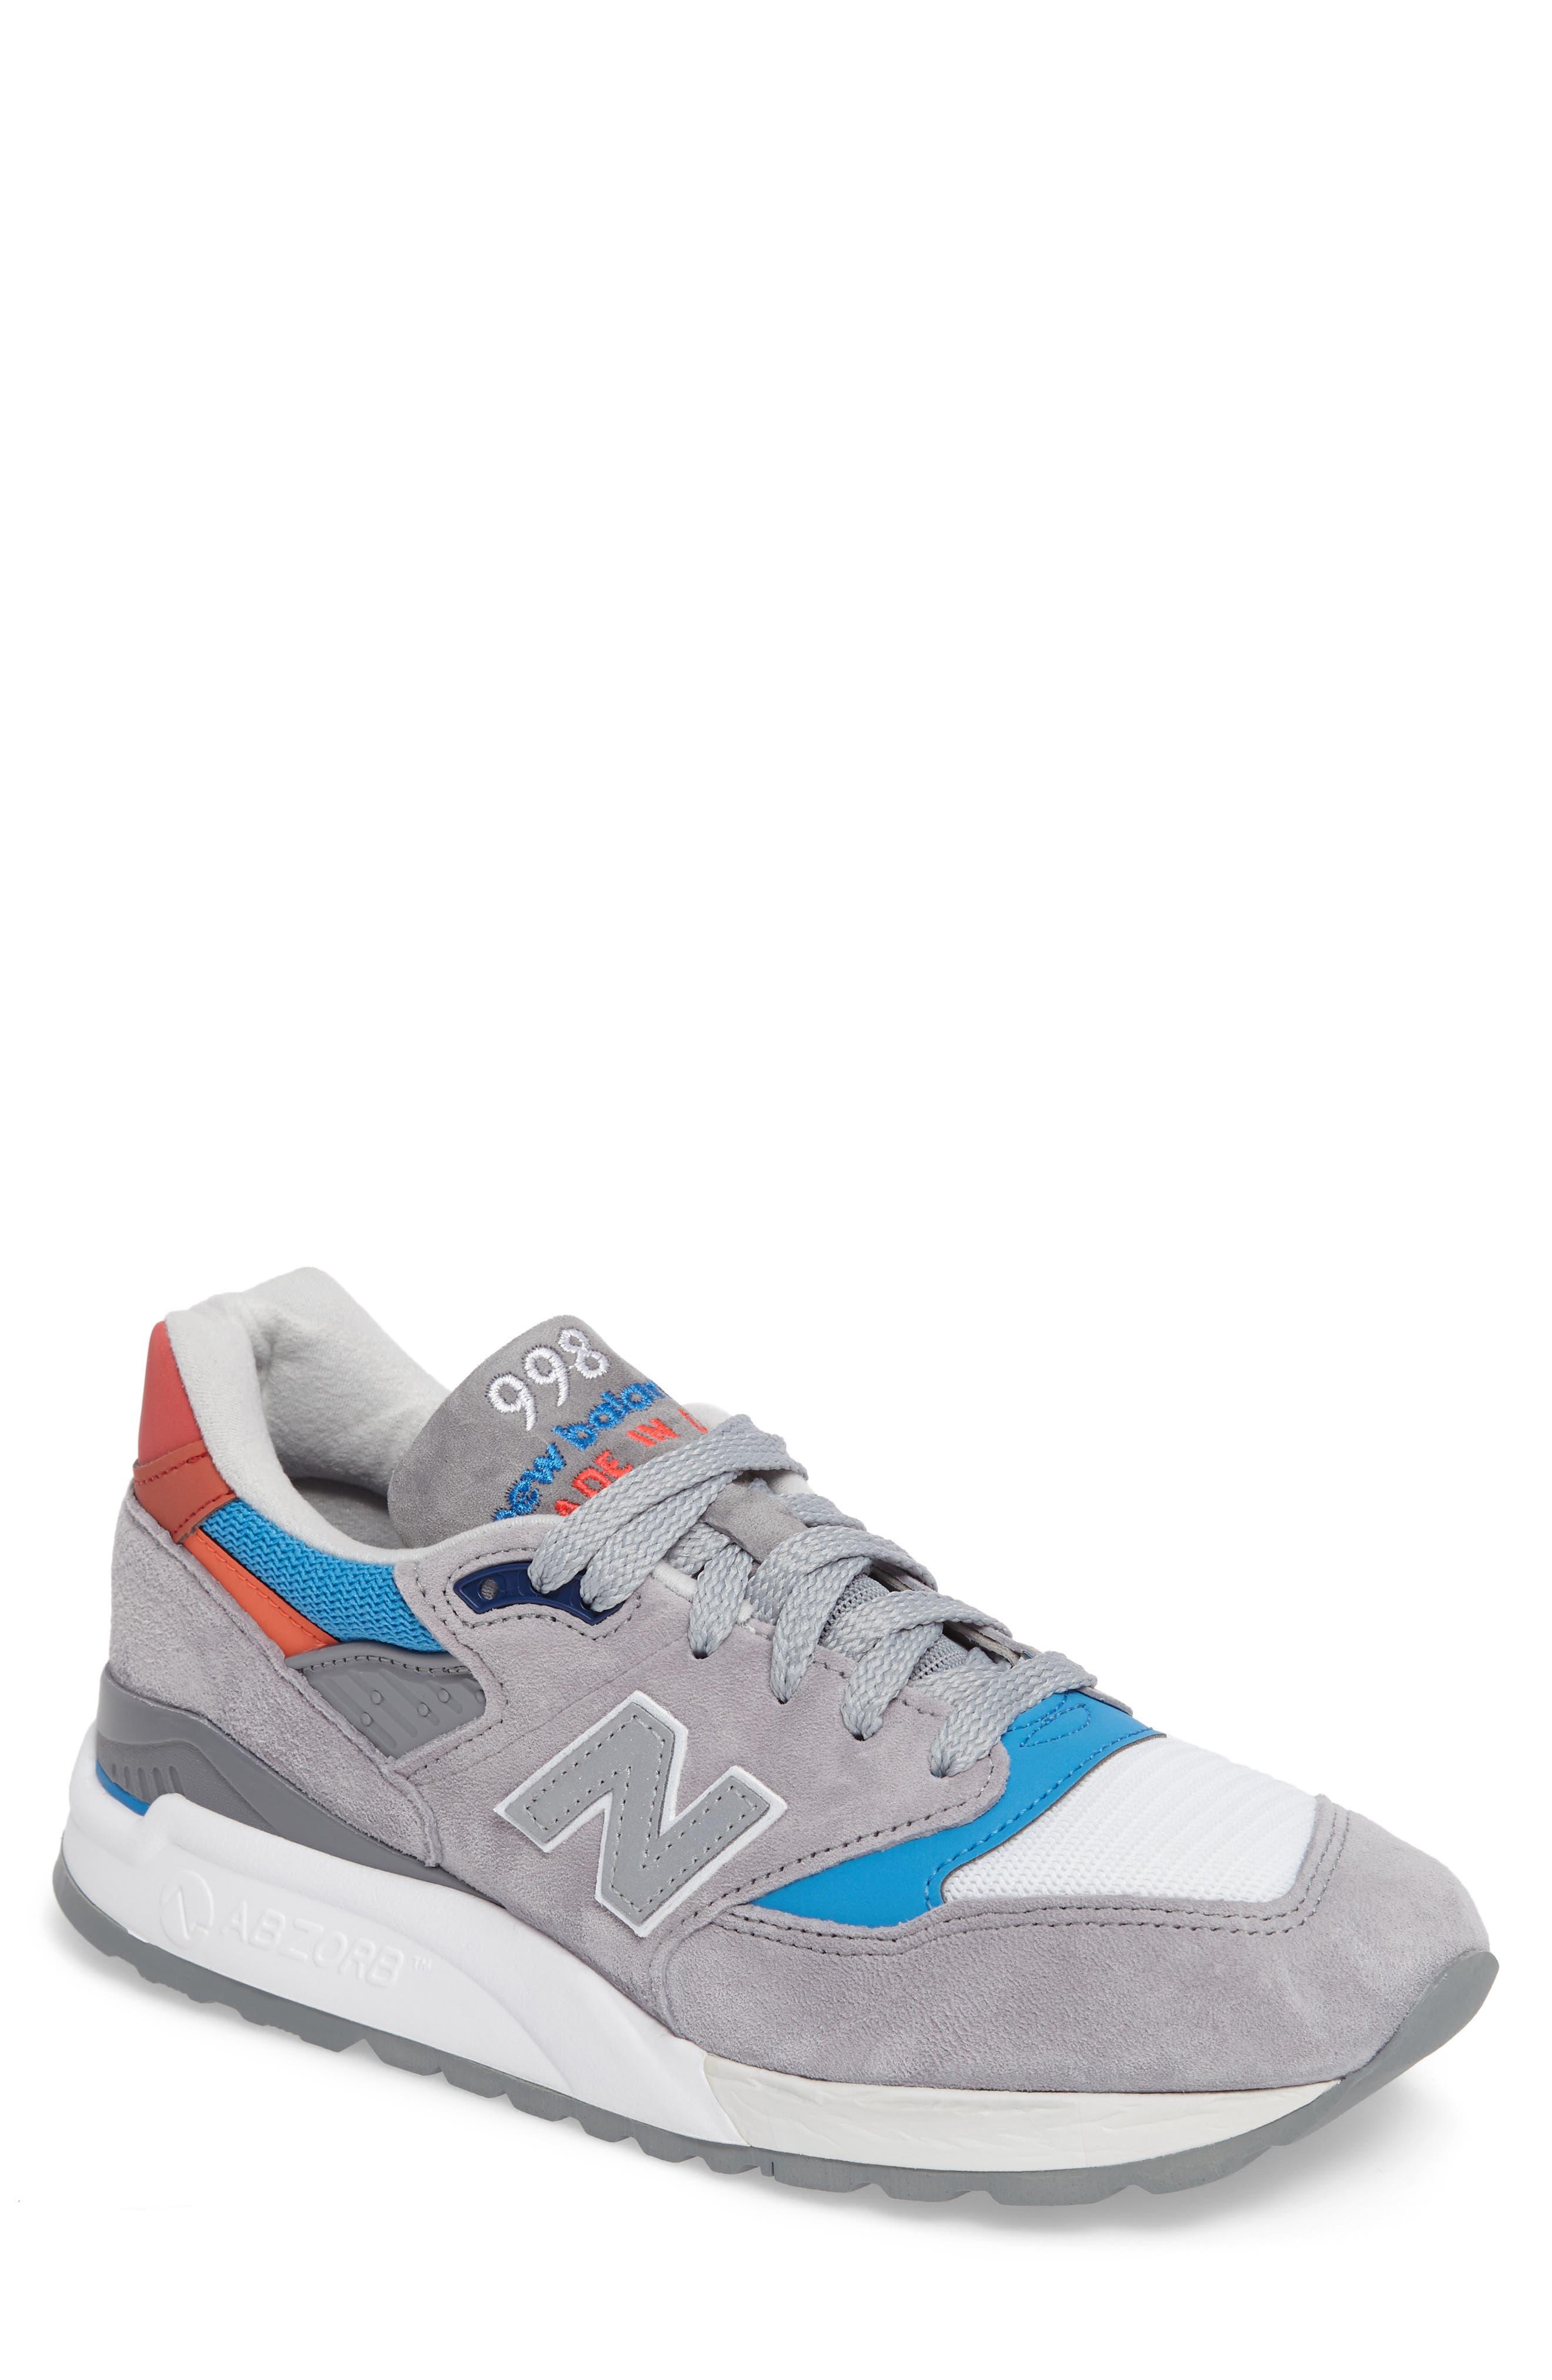 New Balance 998 Sneaker (Men)